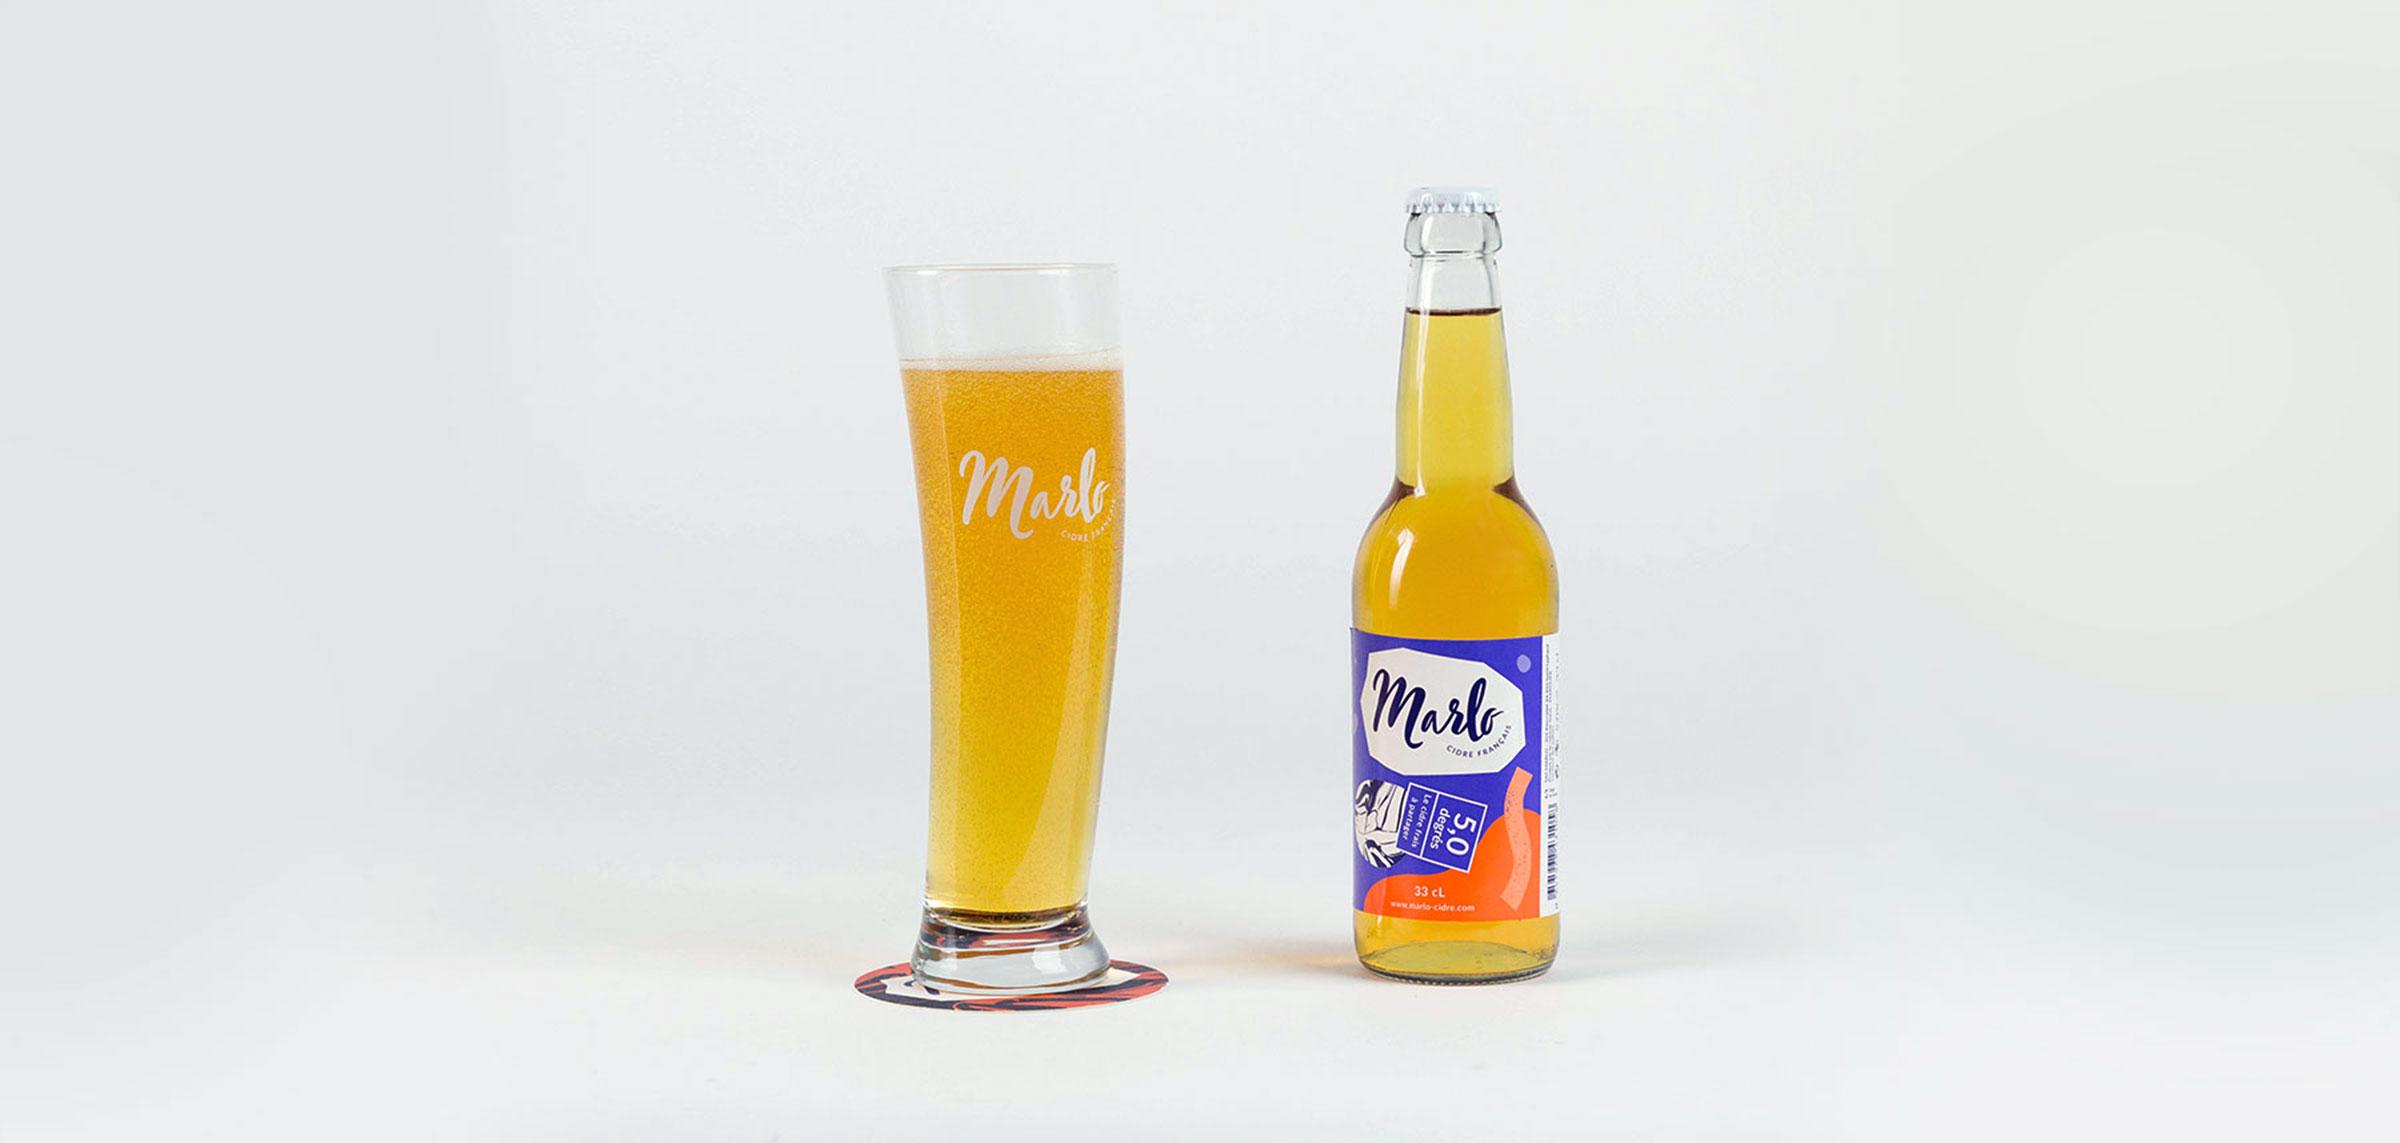 Marlo verre bouteille cidre design